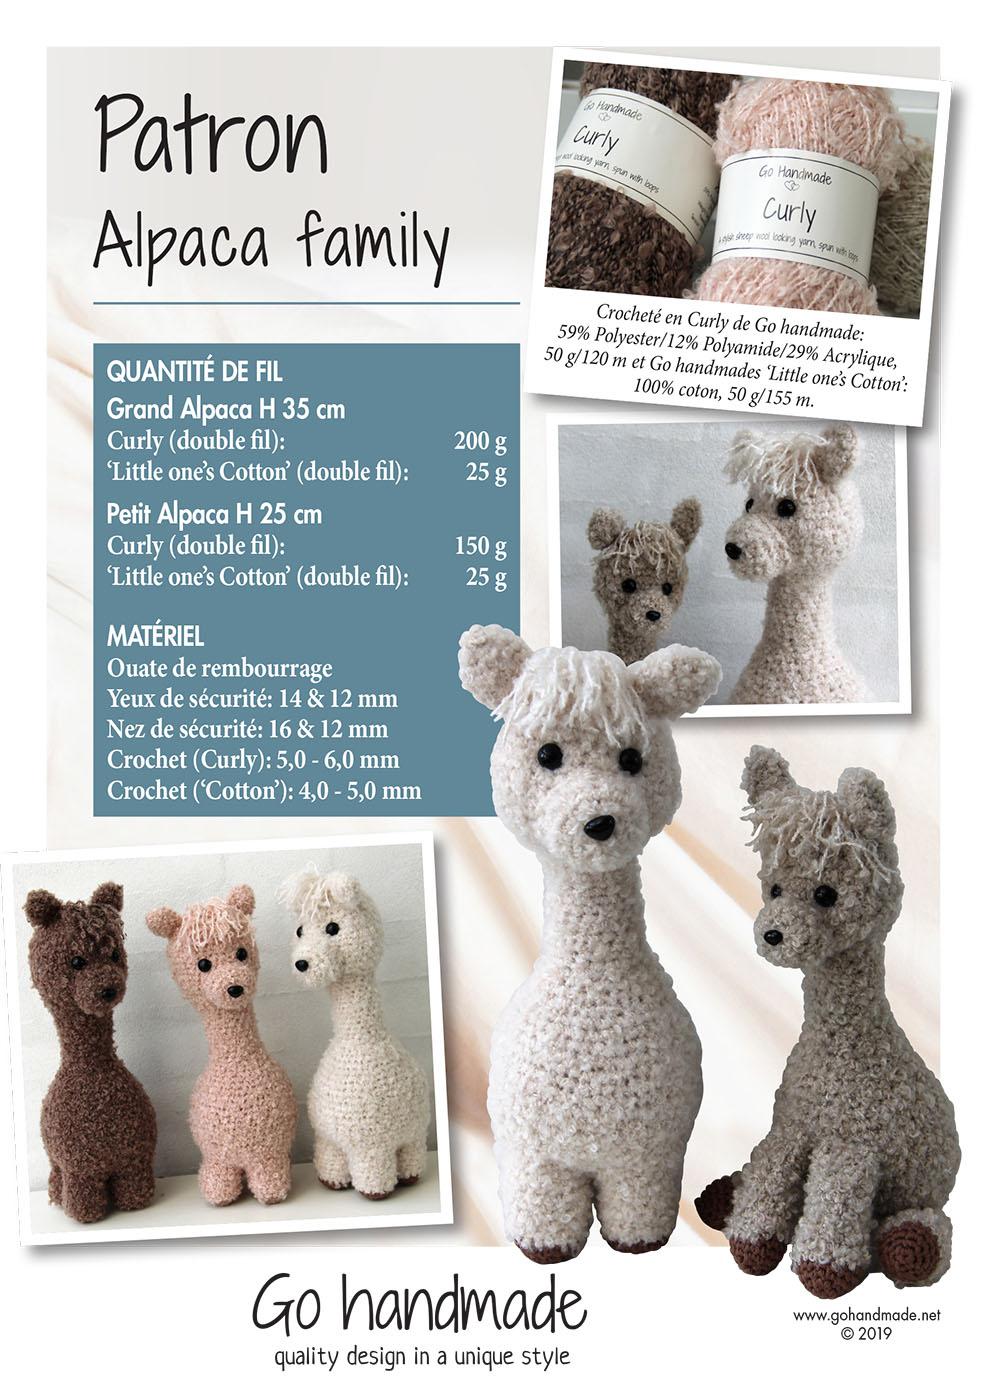 cosicasraquel: Llama Lovers Diy & Crochet | 1400x987